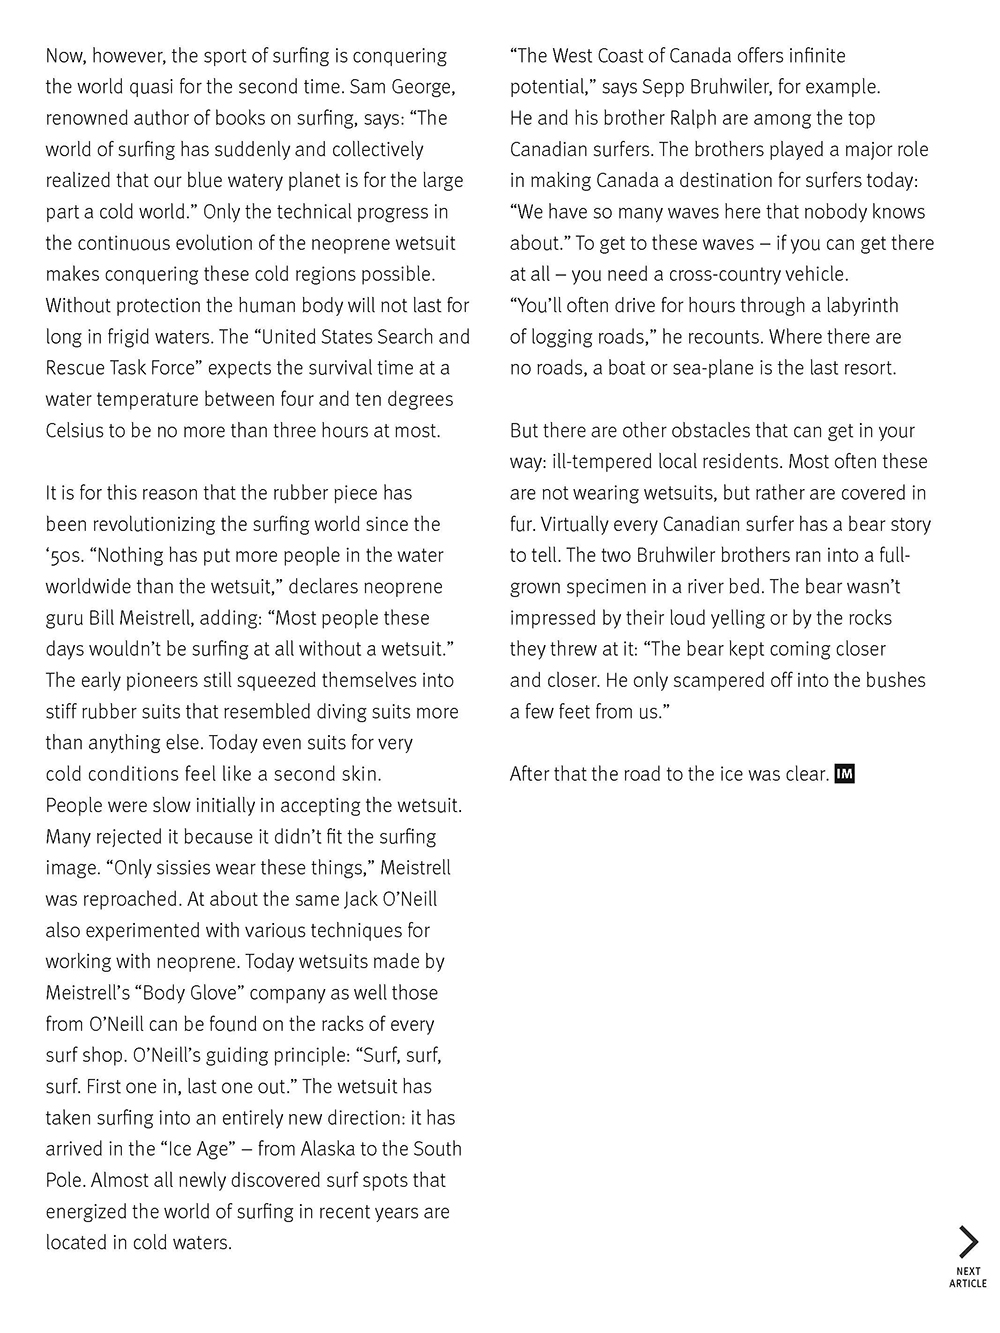 Infiniti_Surfing_Page_6.jpg